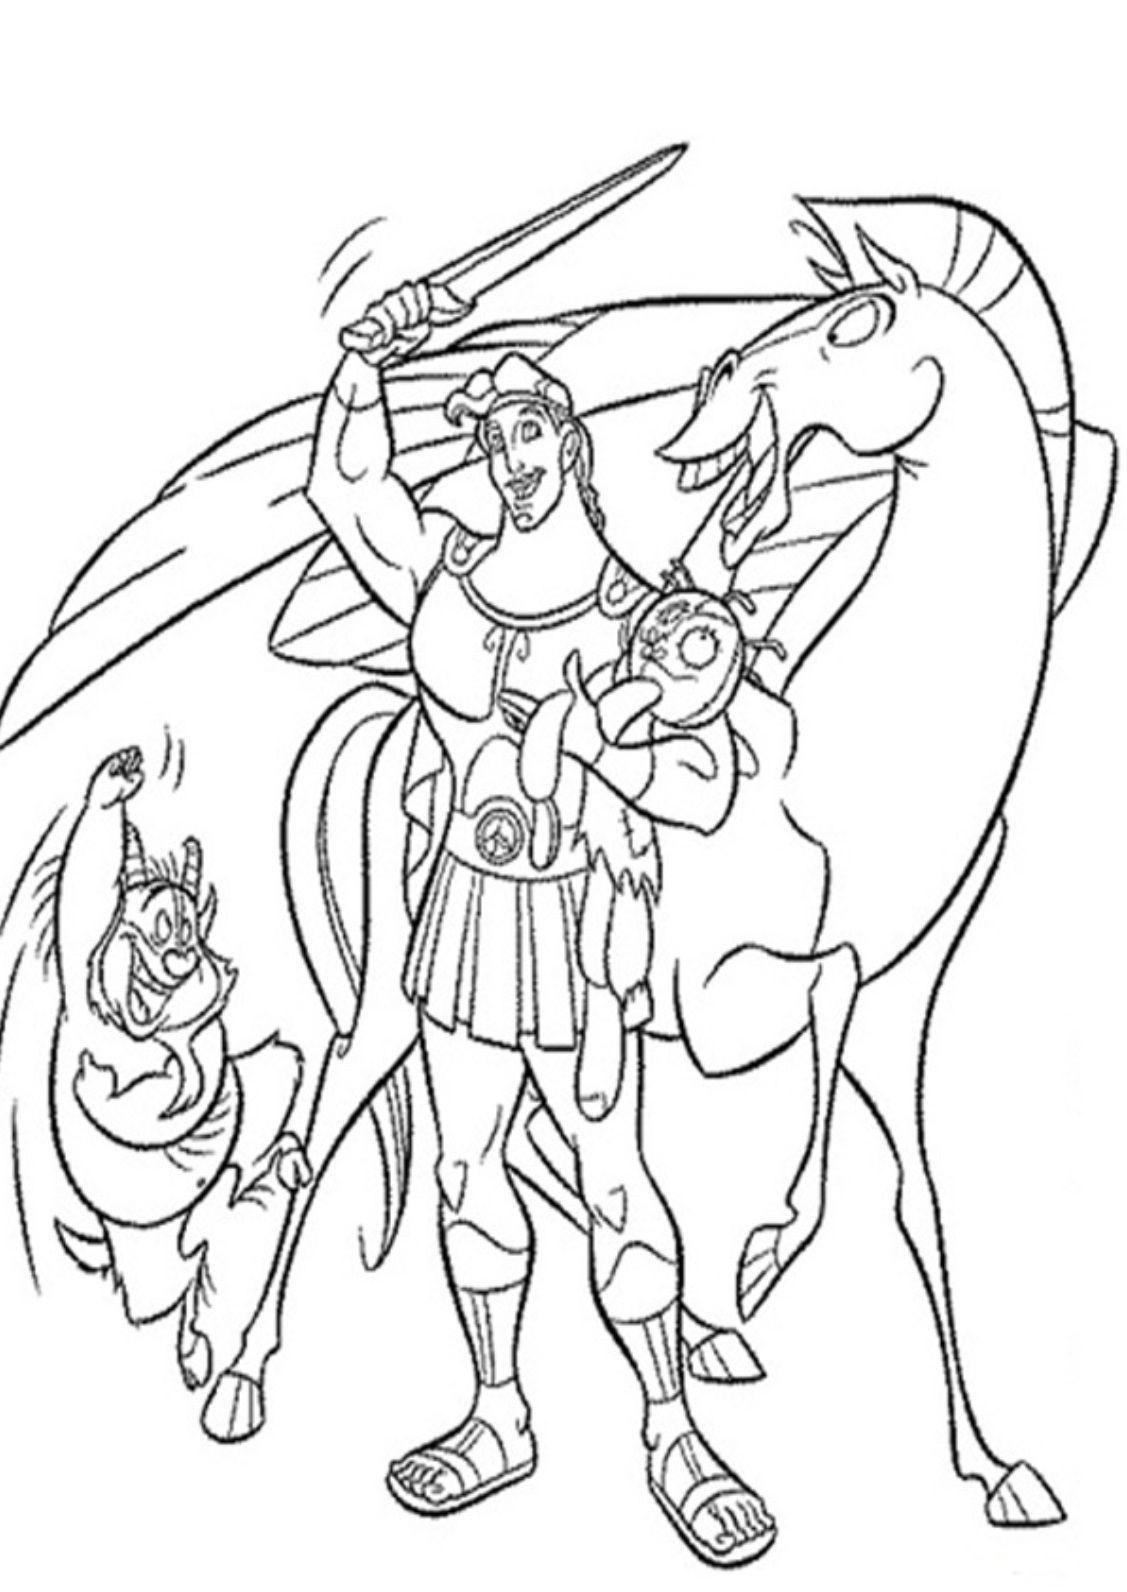 Hercules Coloring Pages Coloring | Goma Eva | Pinterest | Goma eva ...